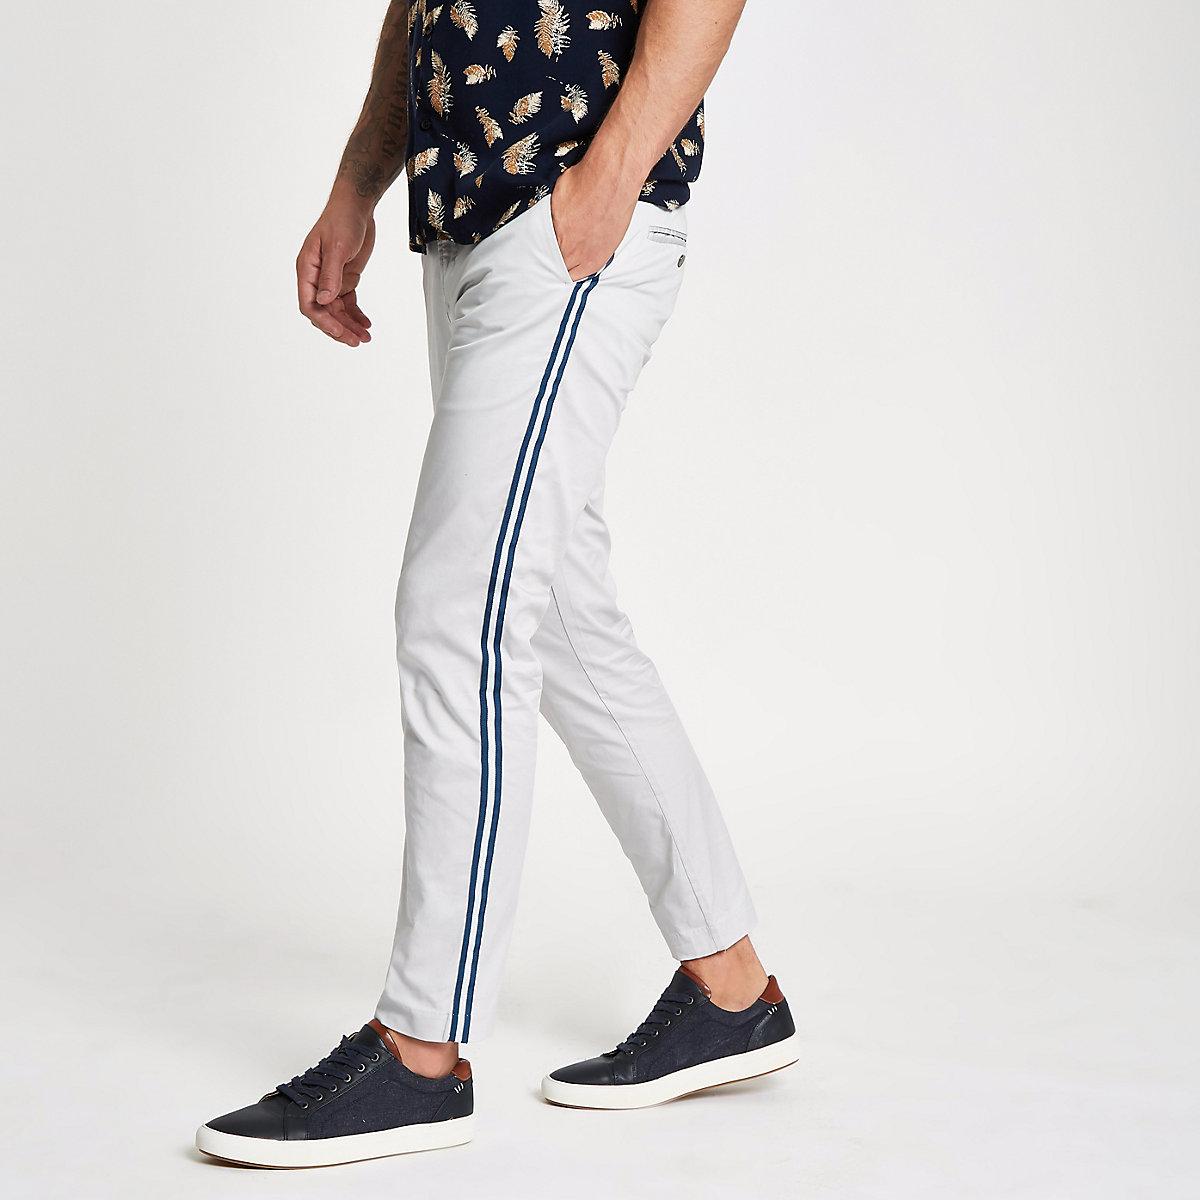 Grey tape side skinny fit pants